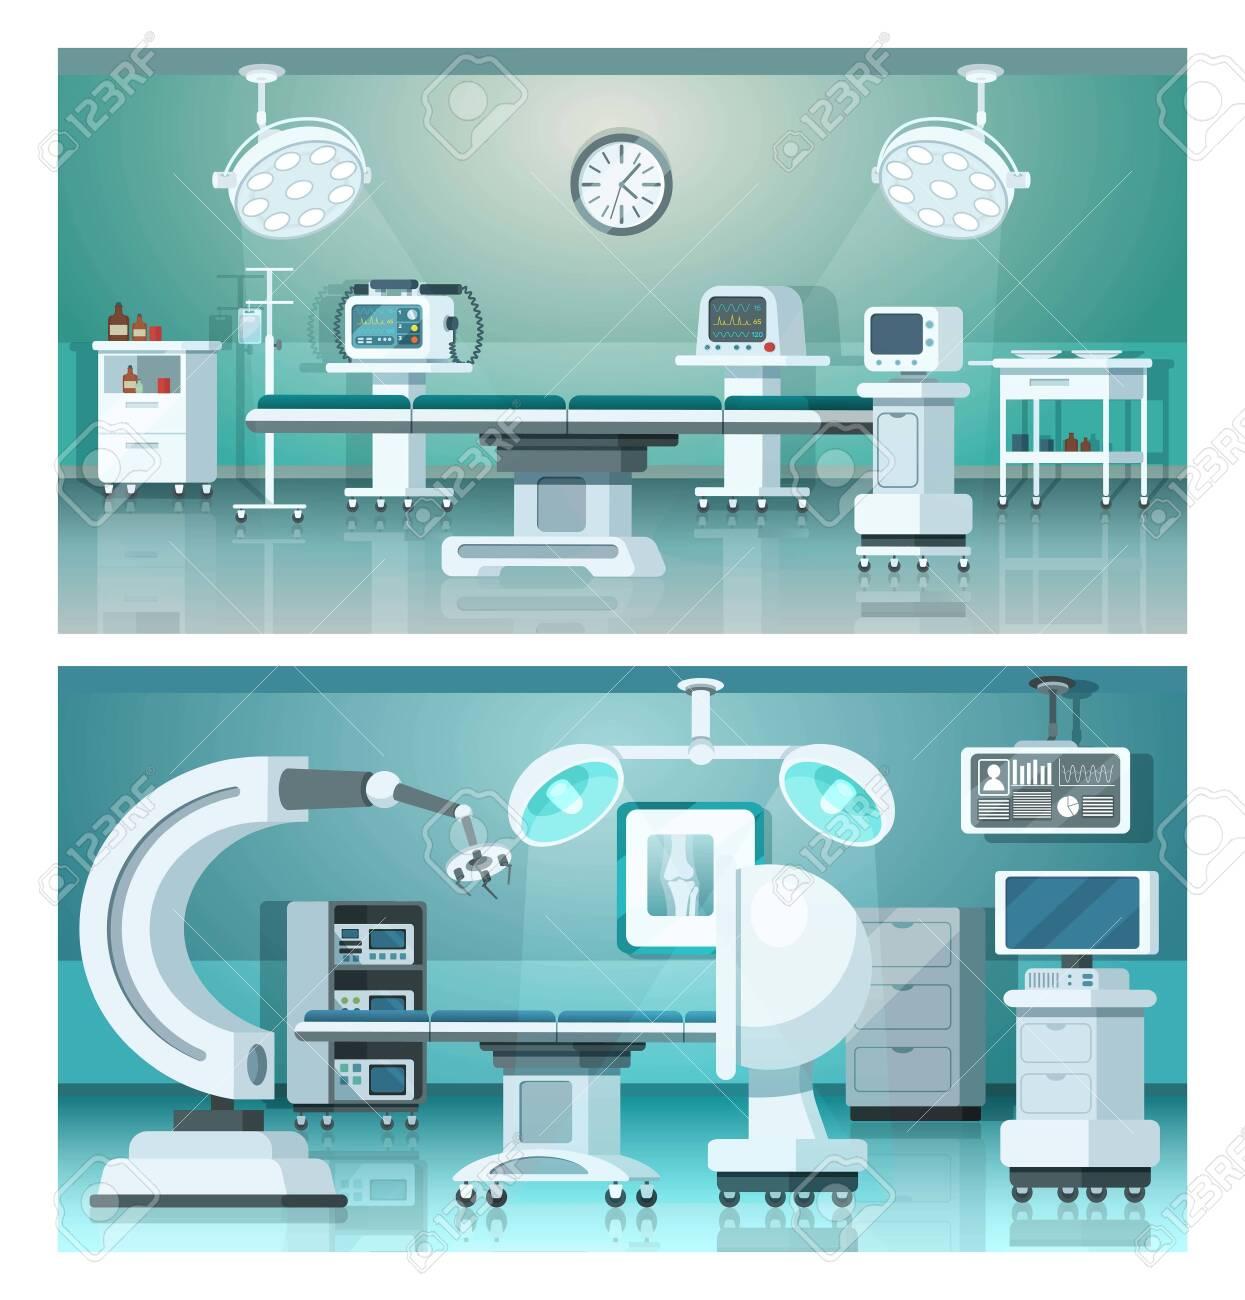 Hybrid operating isometric medicine hospital operating rooms on medical vector illustration. - 142569141